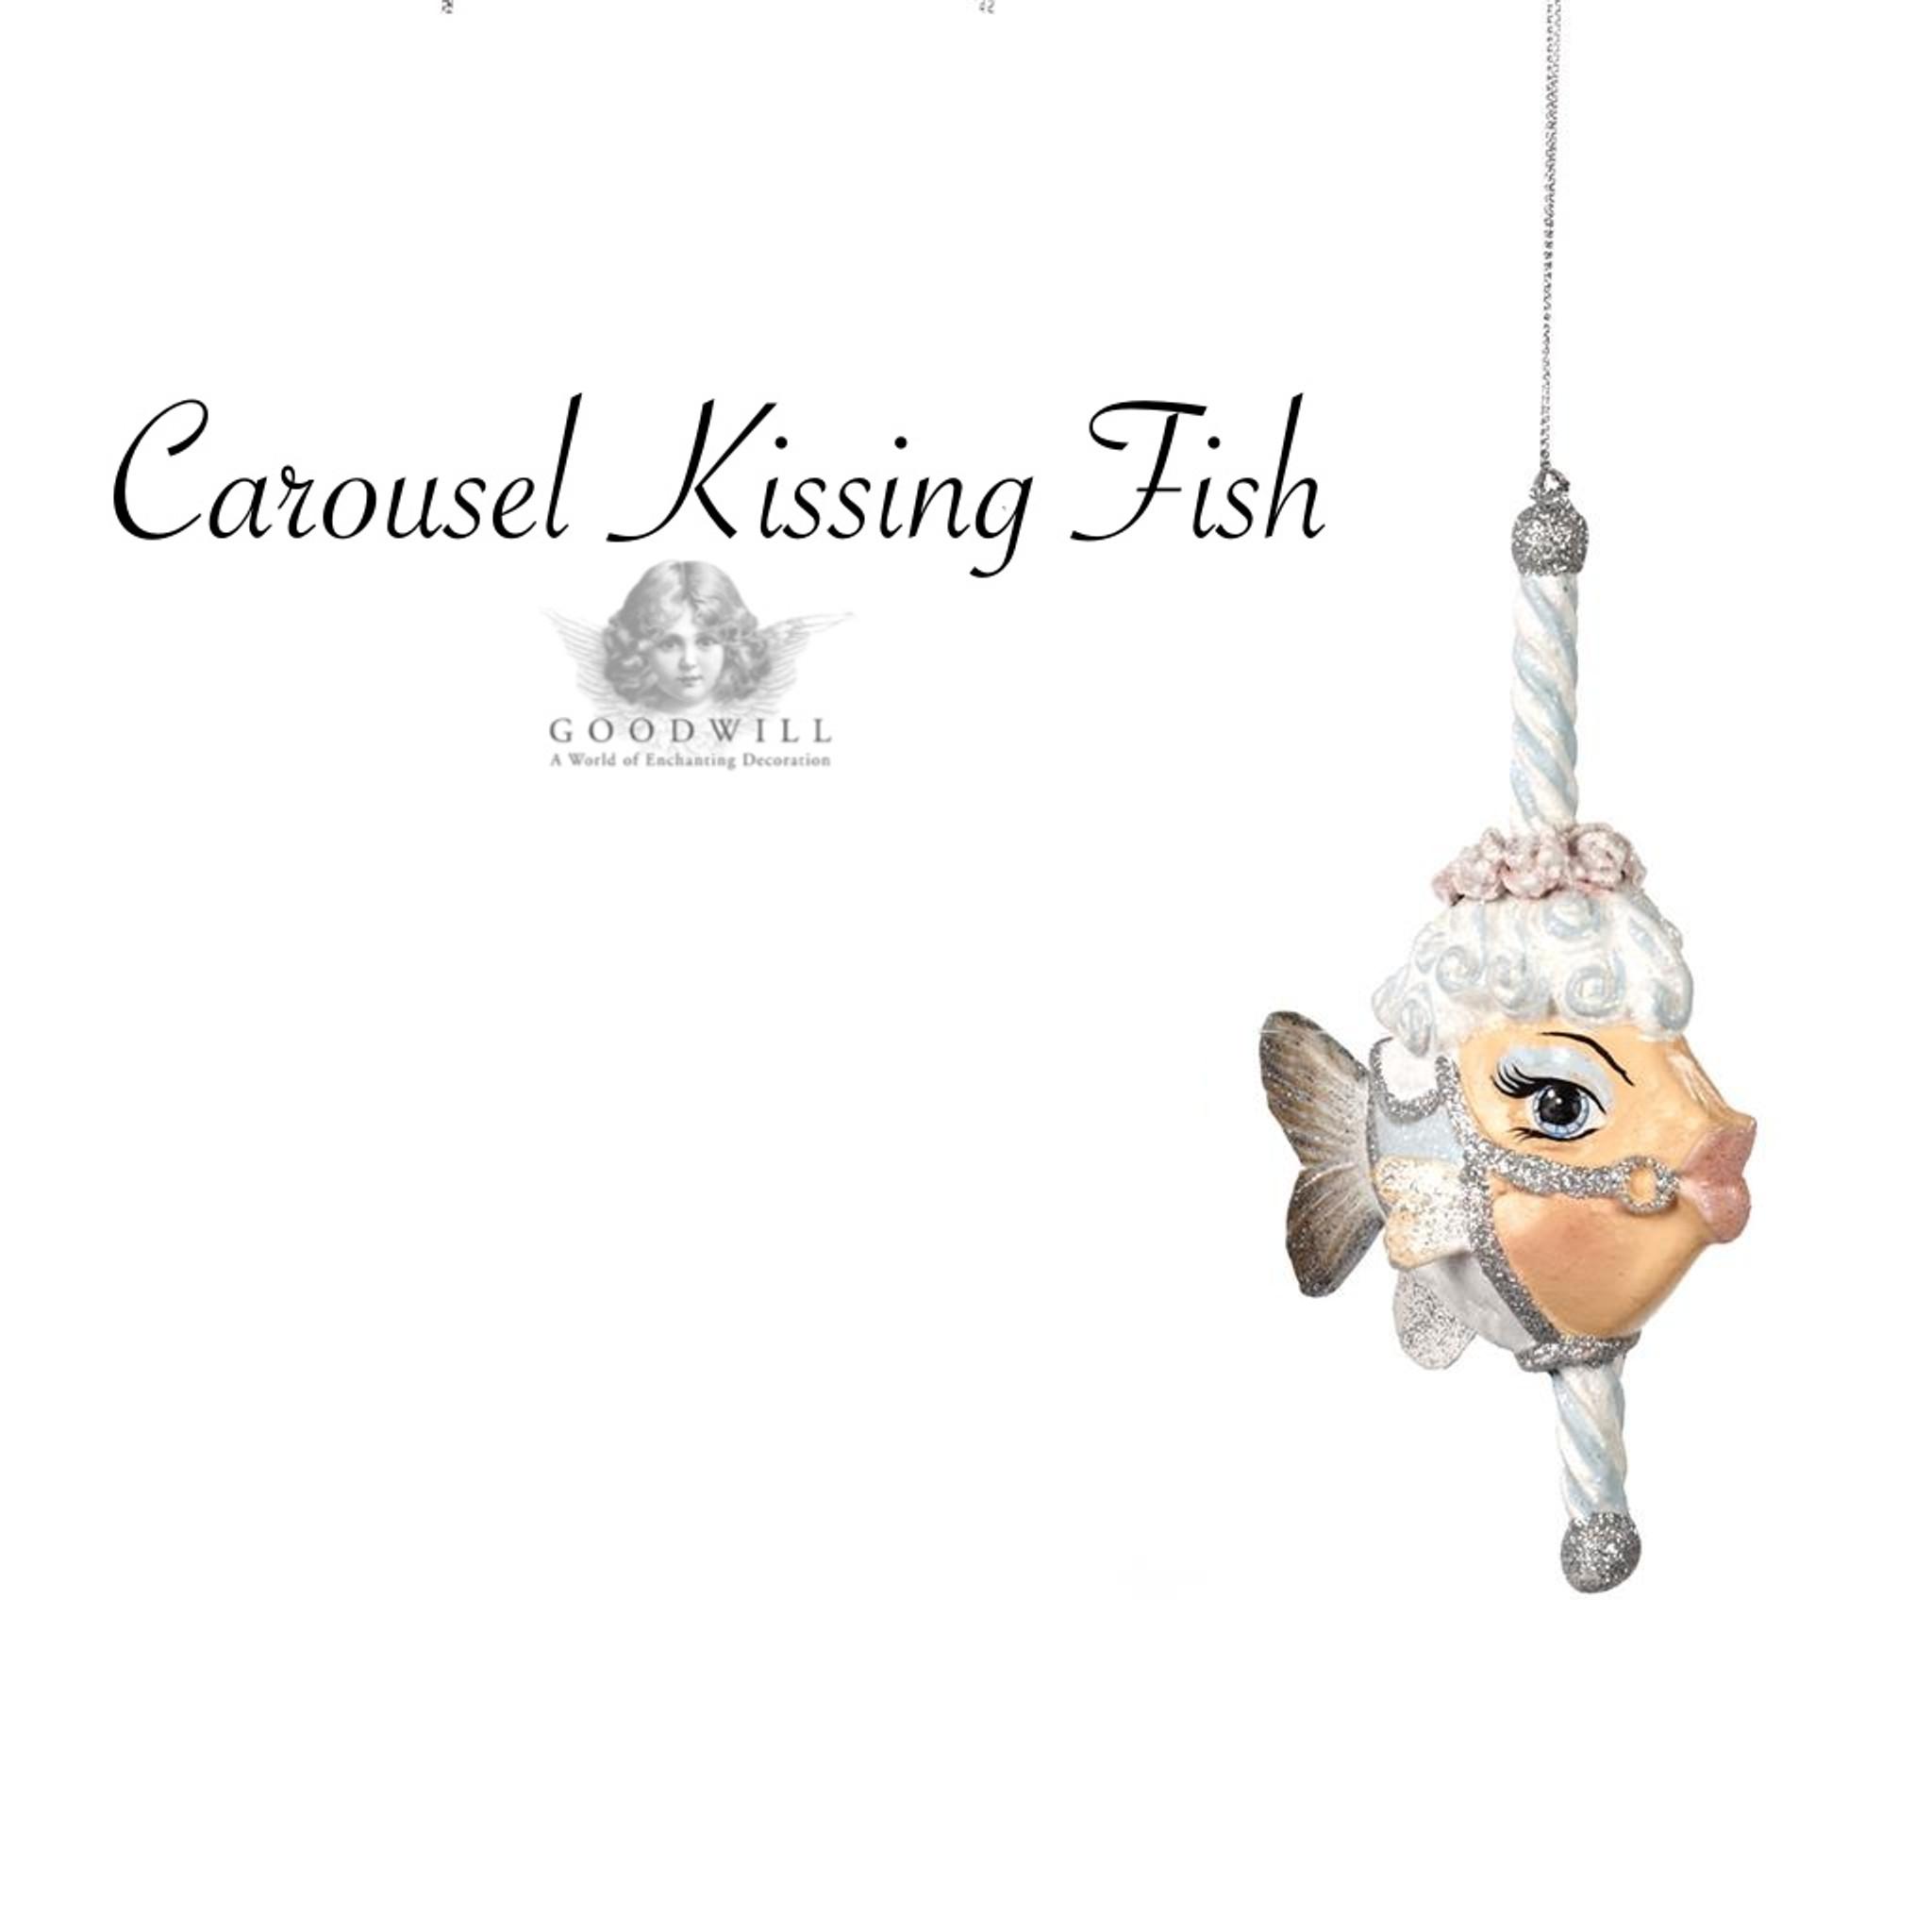 Kissing fish ornament - Carousel Kissing Fish